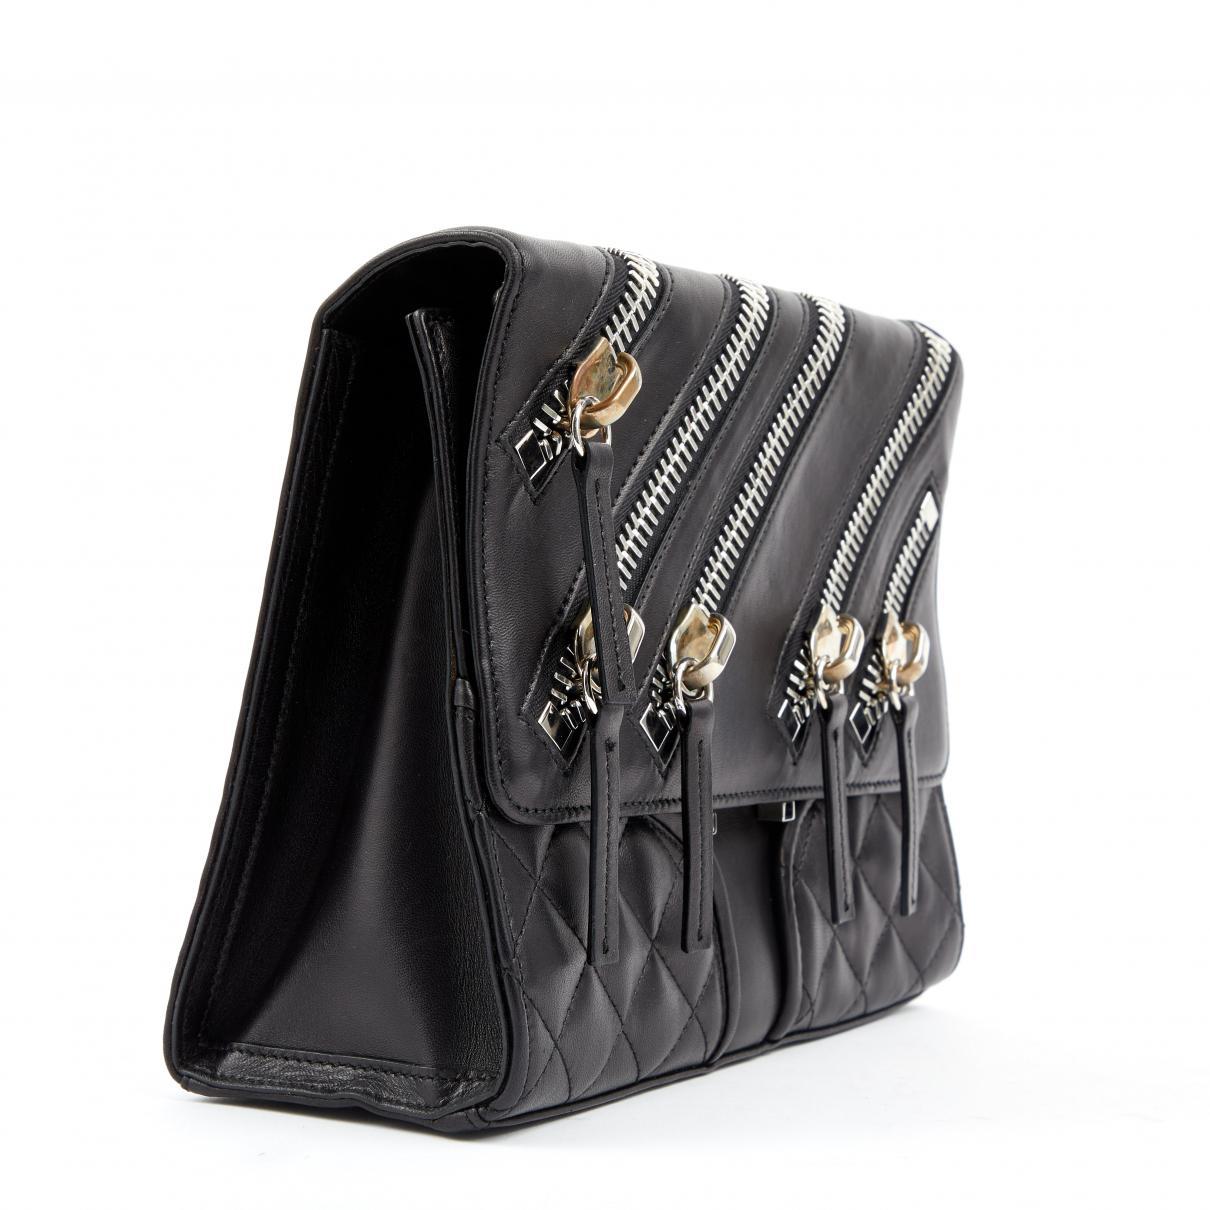 Giuseppe Zanotti Pre-owned - Leather crossbody bag G3GsorW